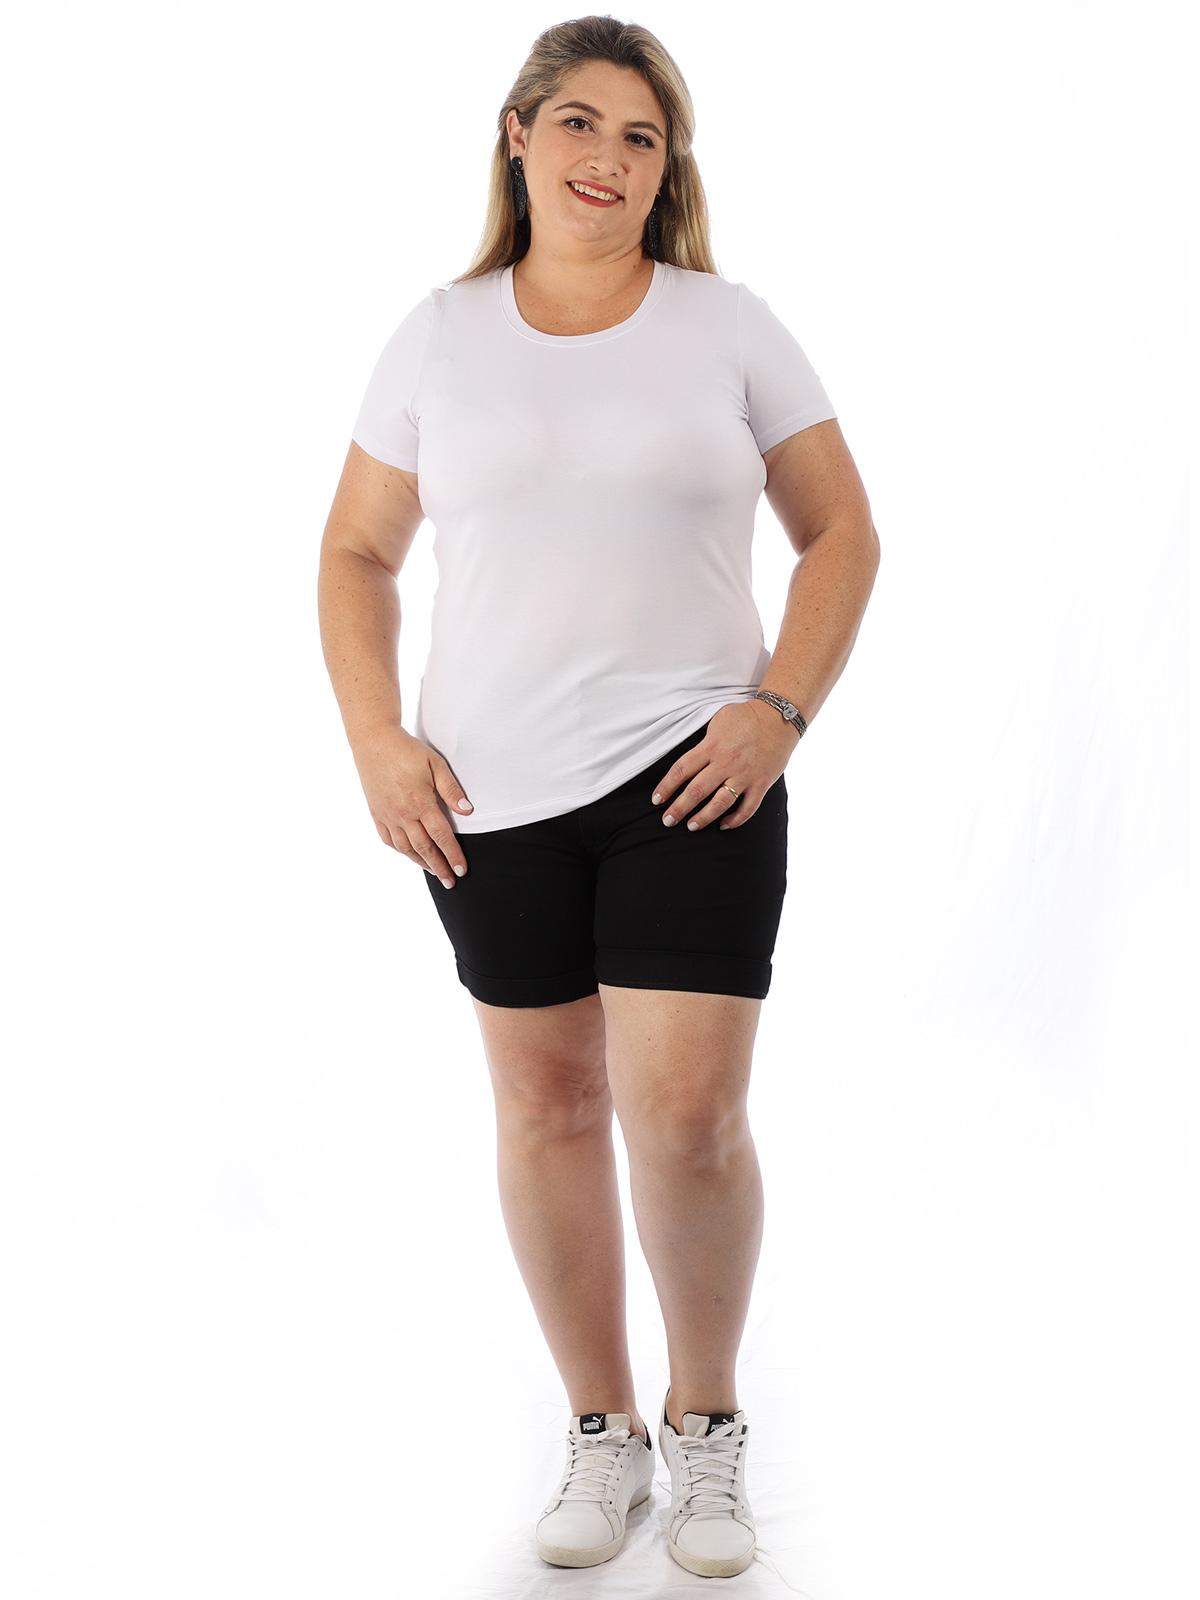 Blusa Plus Size Feminina Viscolycra Decote Redondo Branco